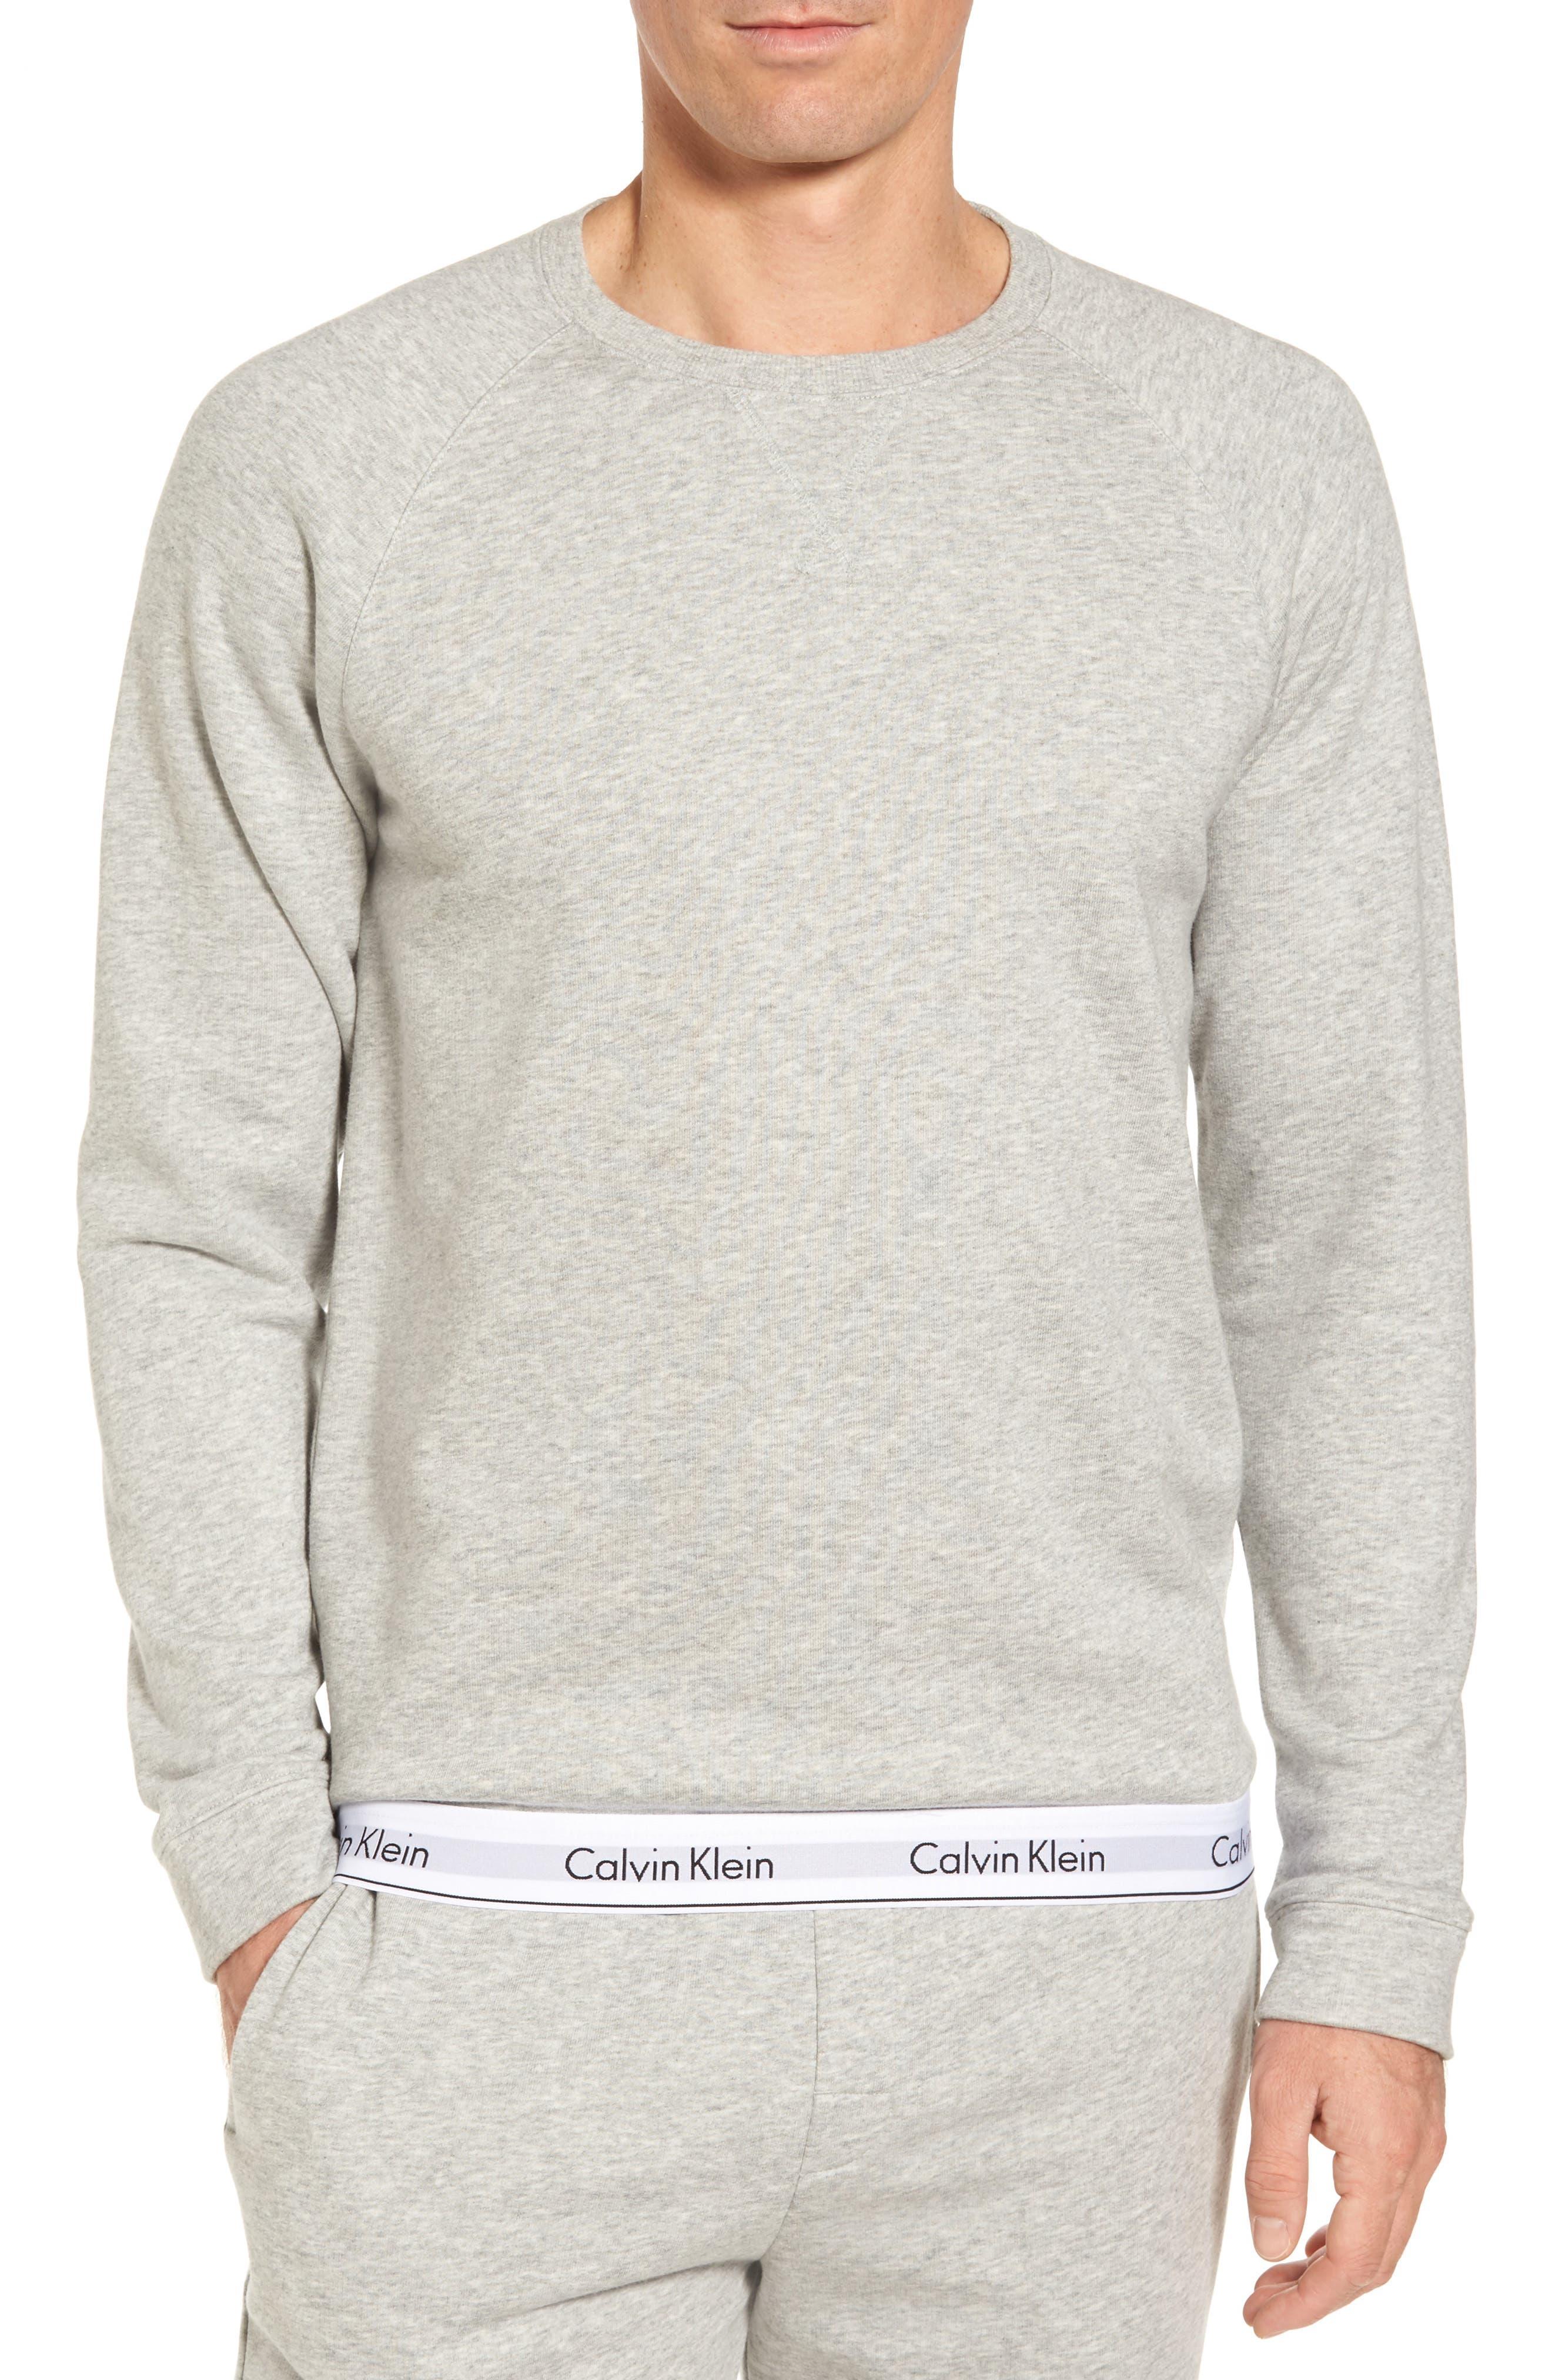 Lounge Crewneck Sweatshirt,                         Main,                         color, Grey Heather